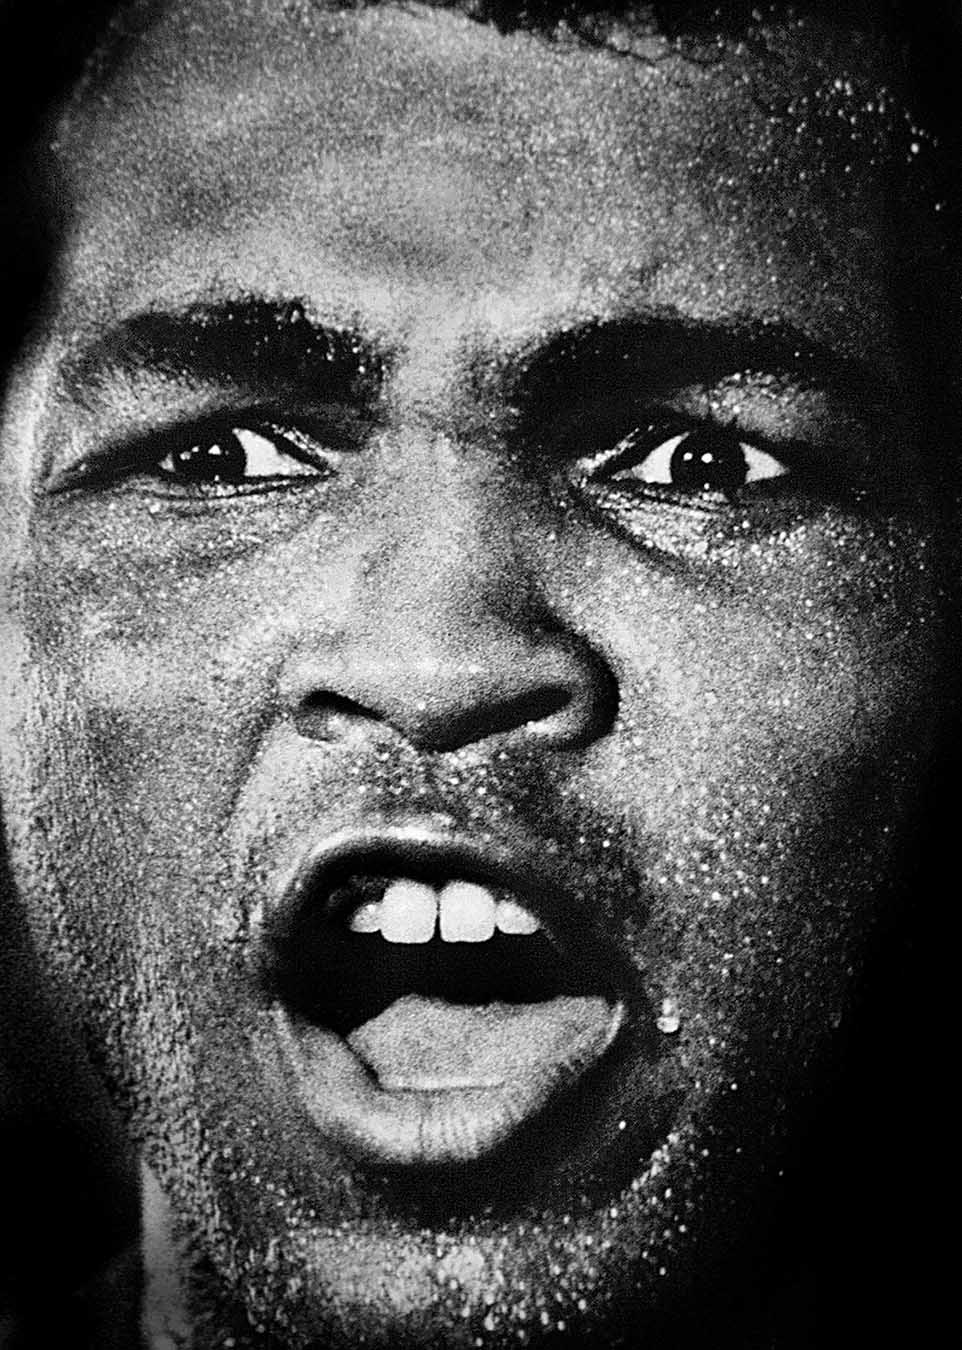 Muhammad Ali at the 5th street gym, Miami Beach.